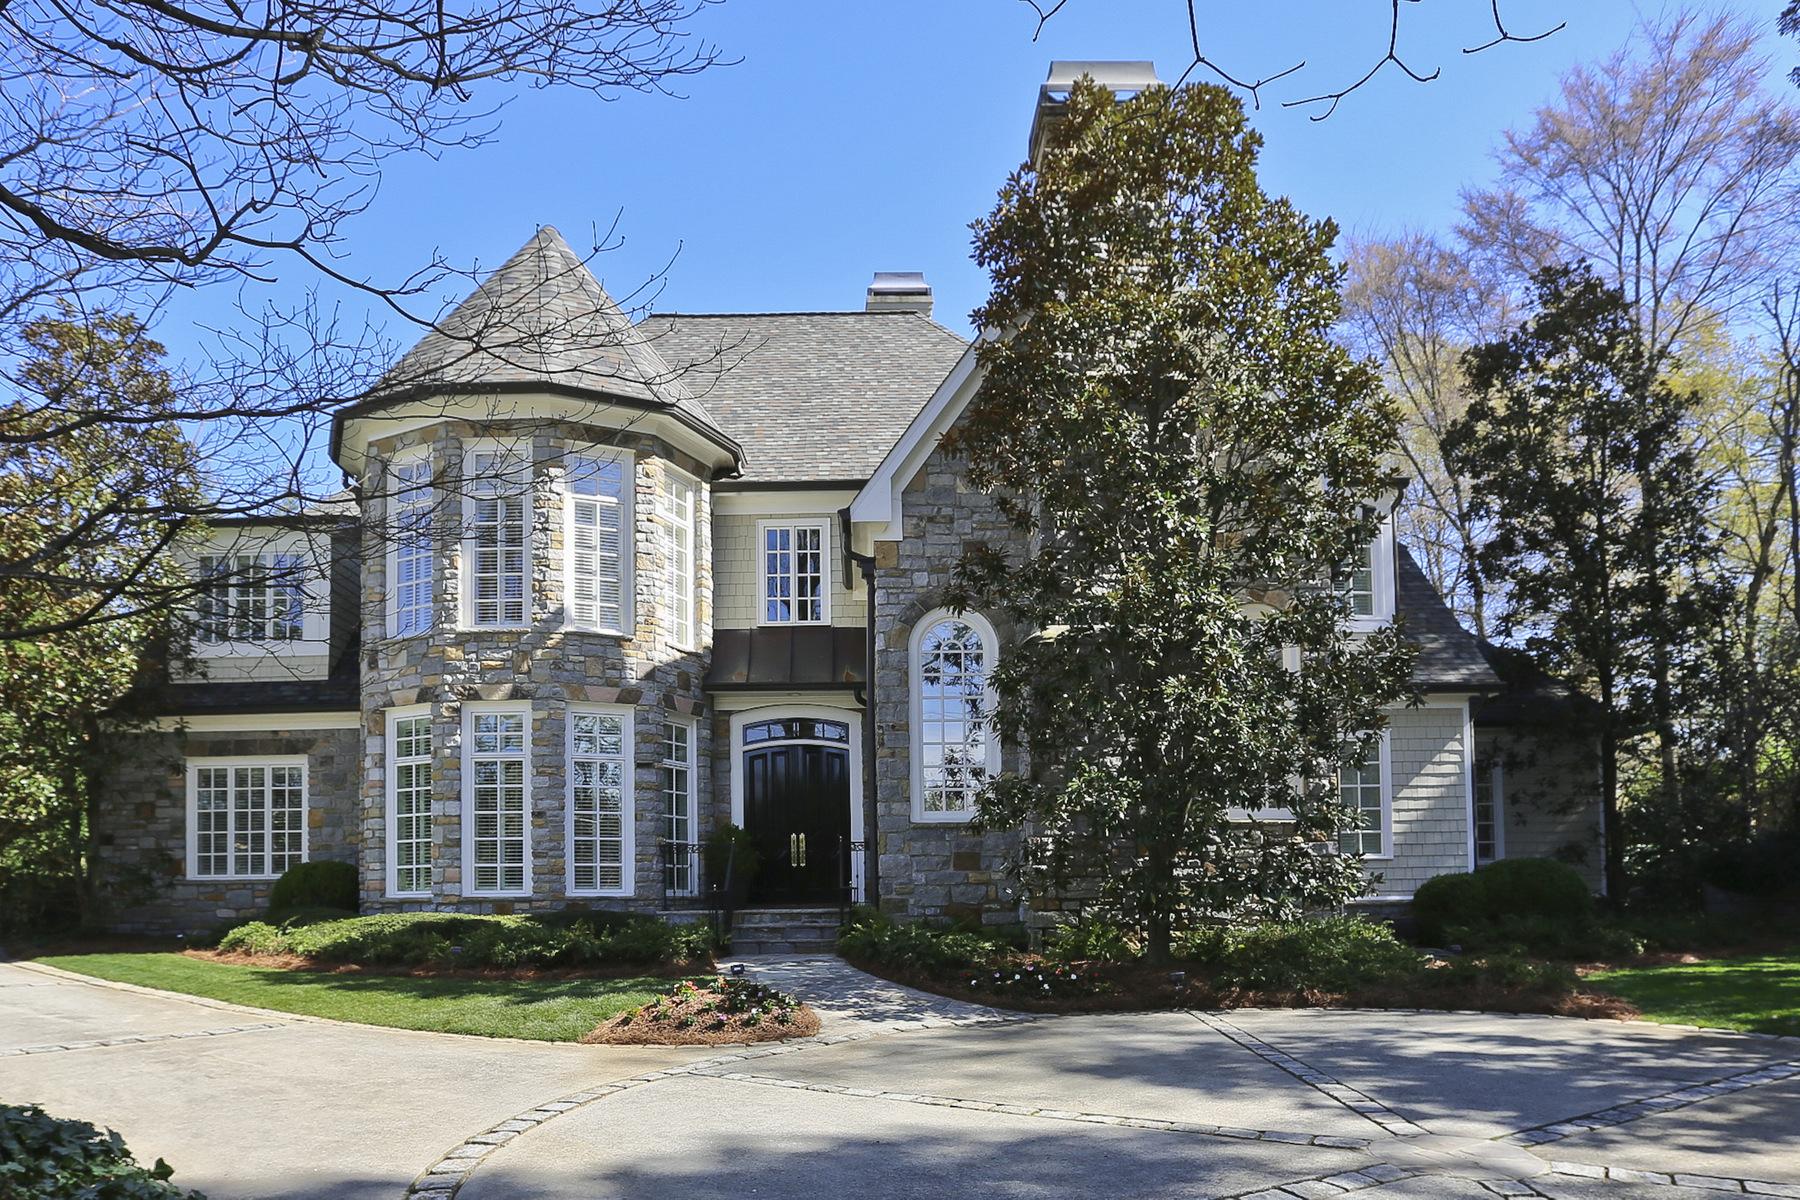 Villa per Vendita alle ore Buckhead Beauty 4037 Wieuca Road NE Buckhead, Atlanta, Georgia, 30342 Stati Uniti